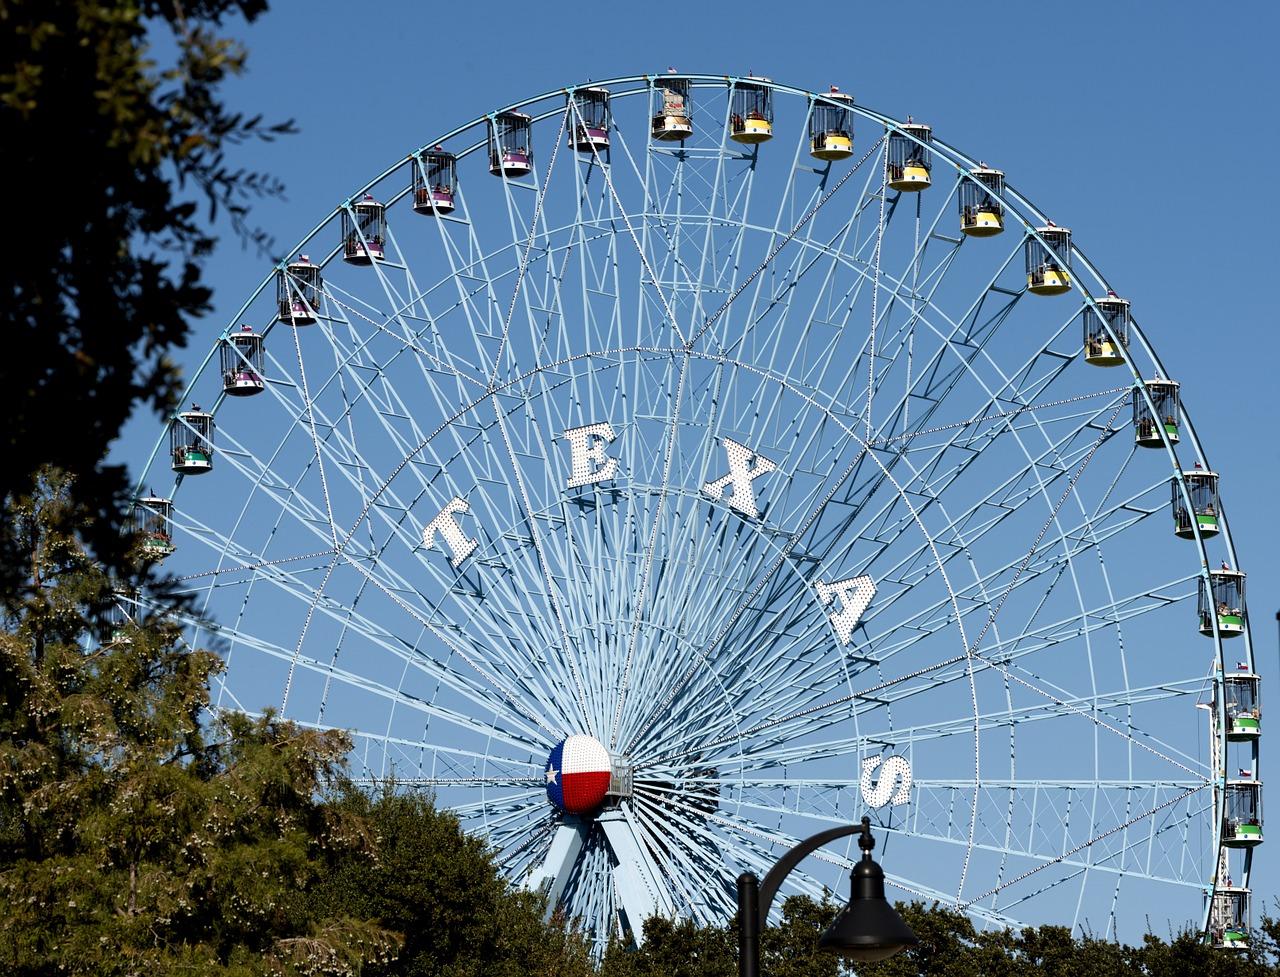 Ferris Wheel - Airbnb Texas